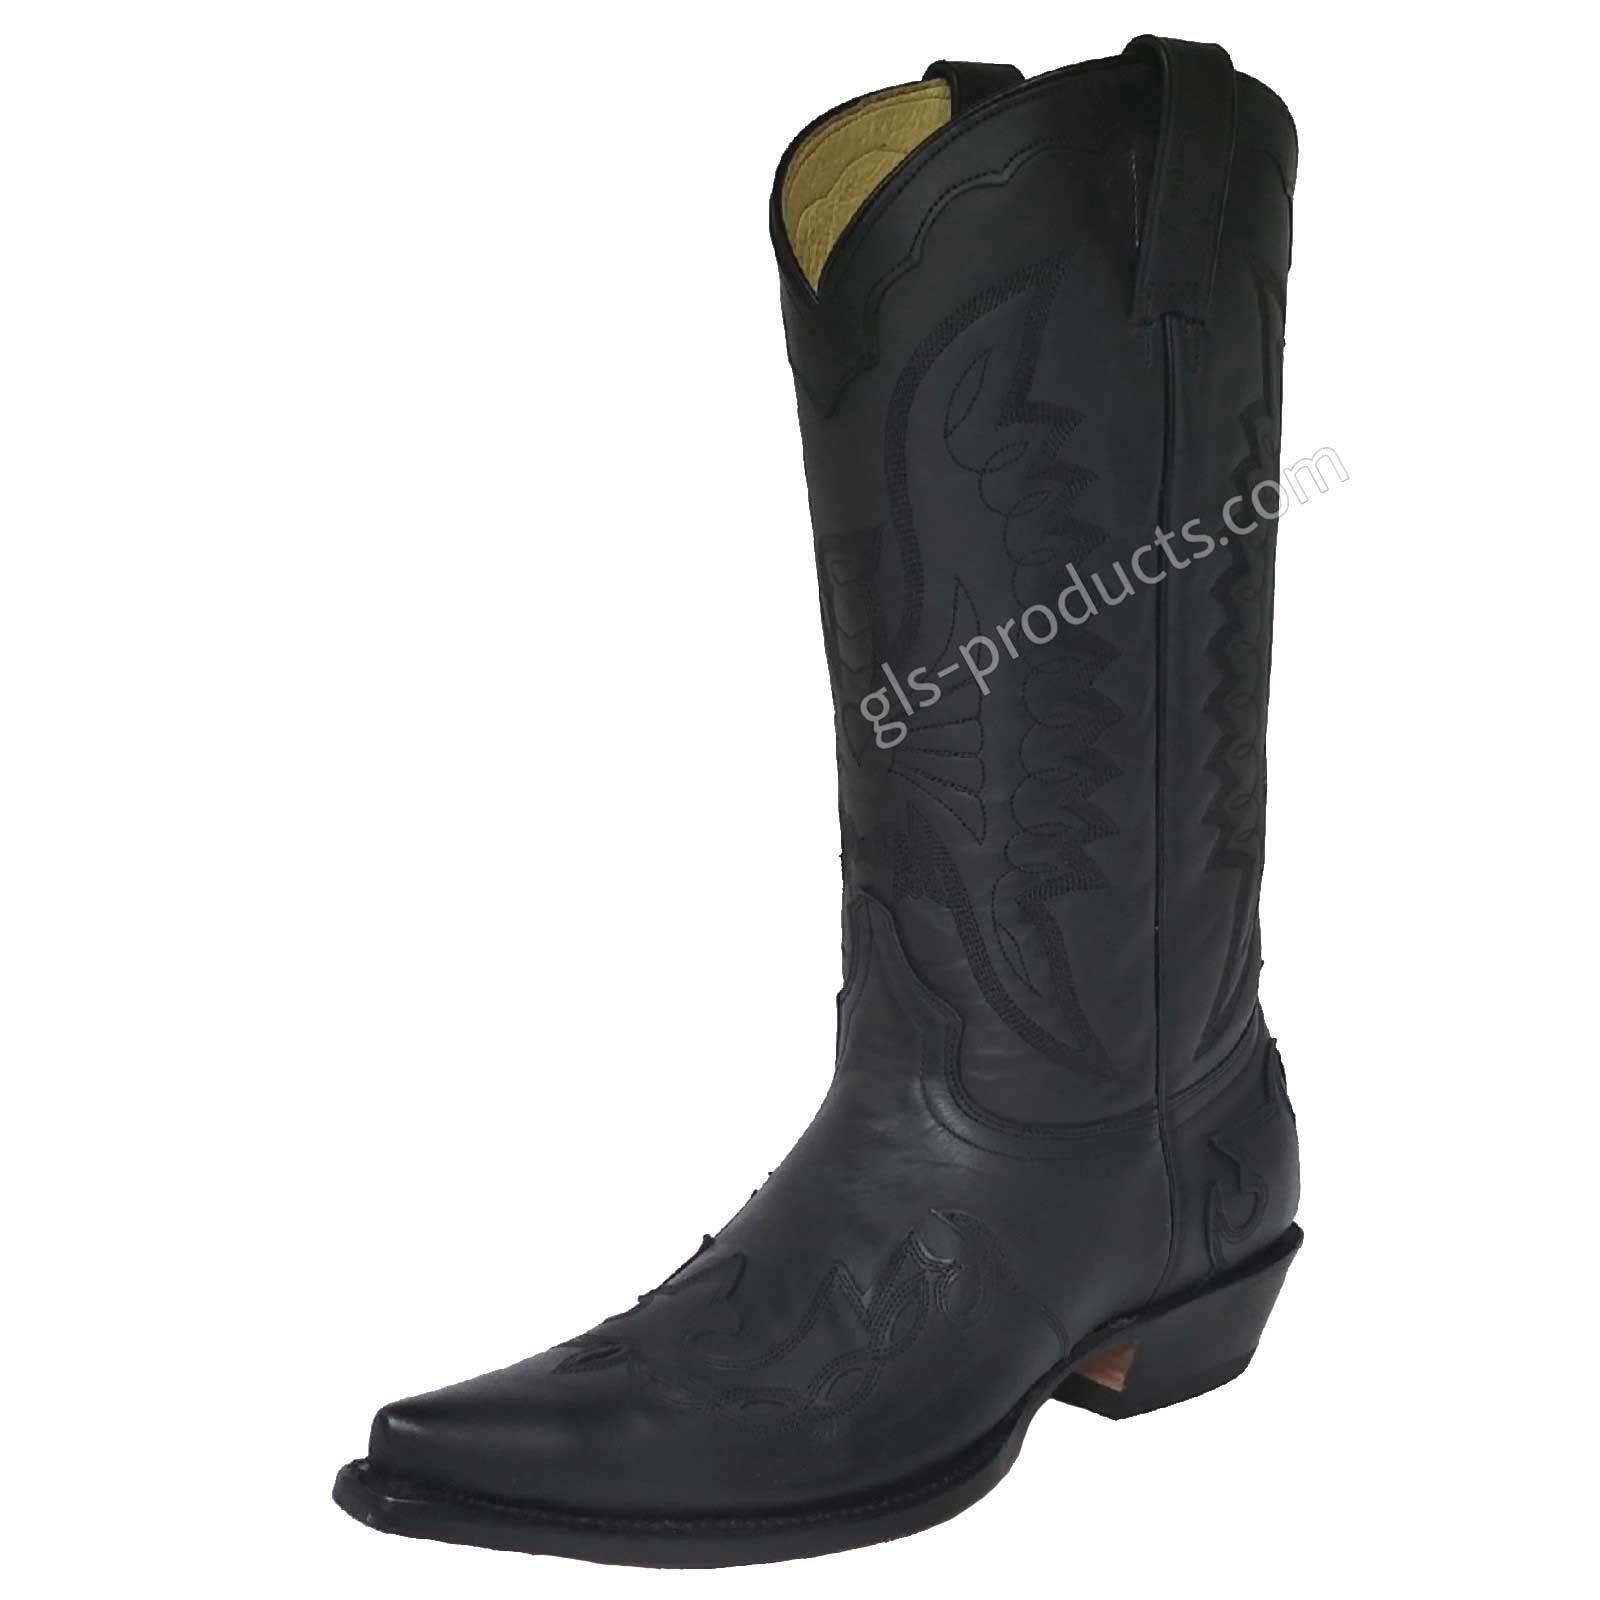 Western Western Western Stiefel Cowboystiefel 5024 Rancho Flammen  schwarz handgenäht Ledersohle a0e600